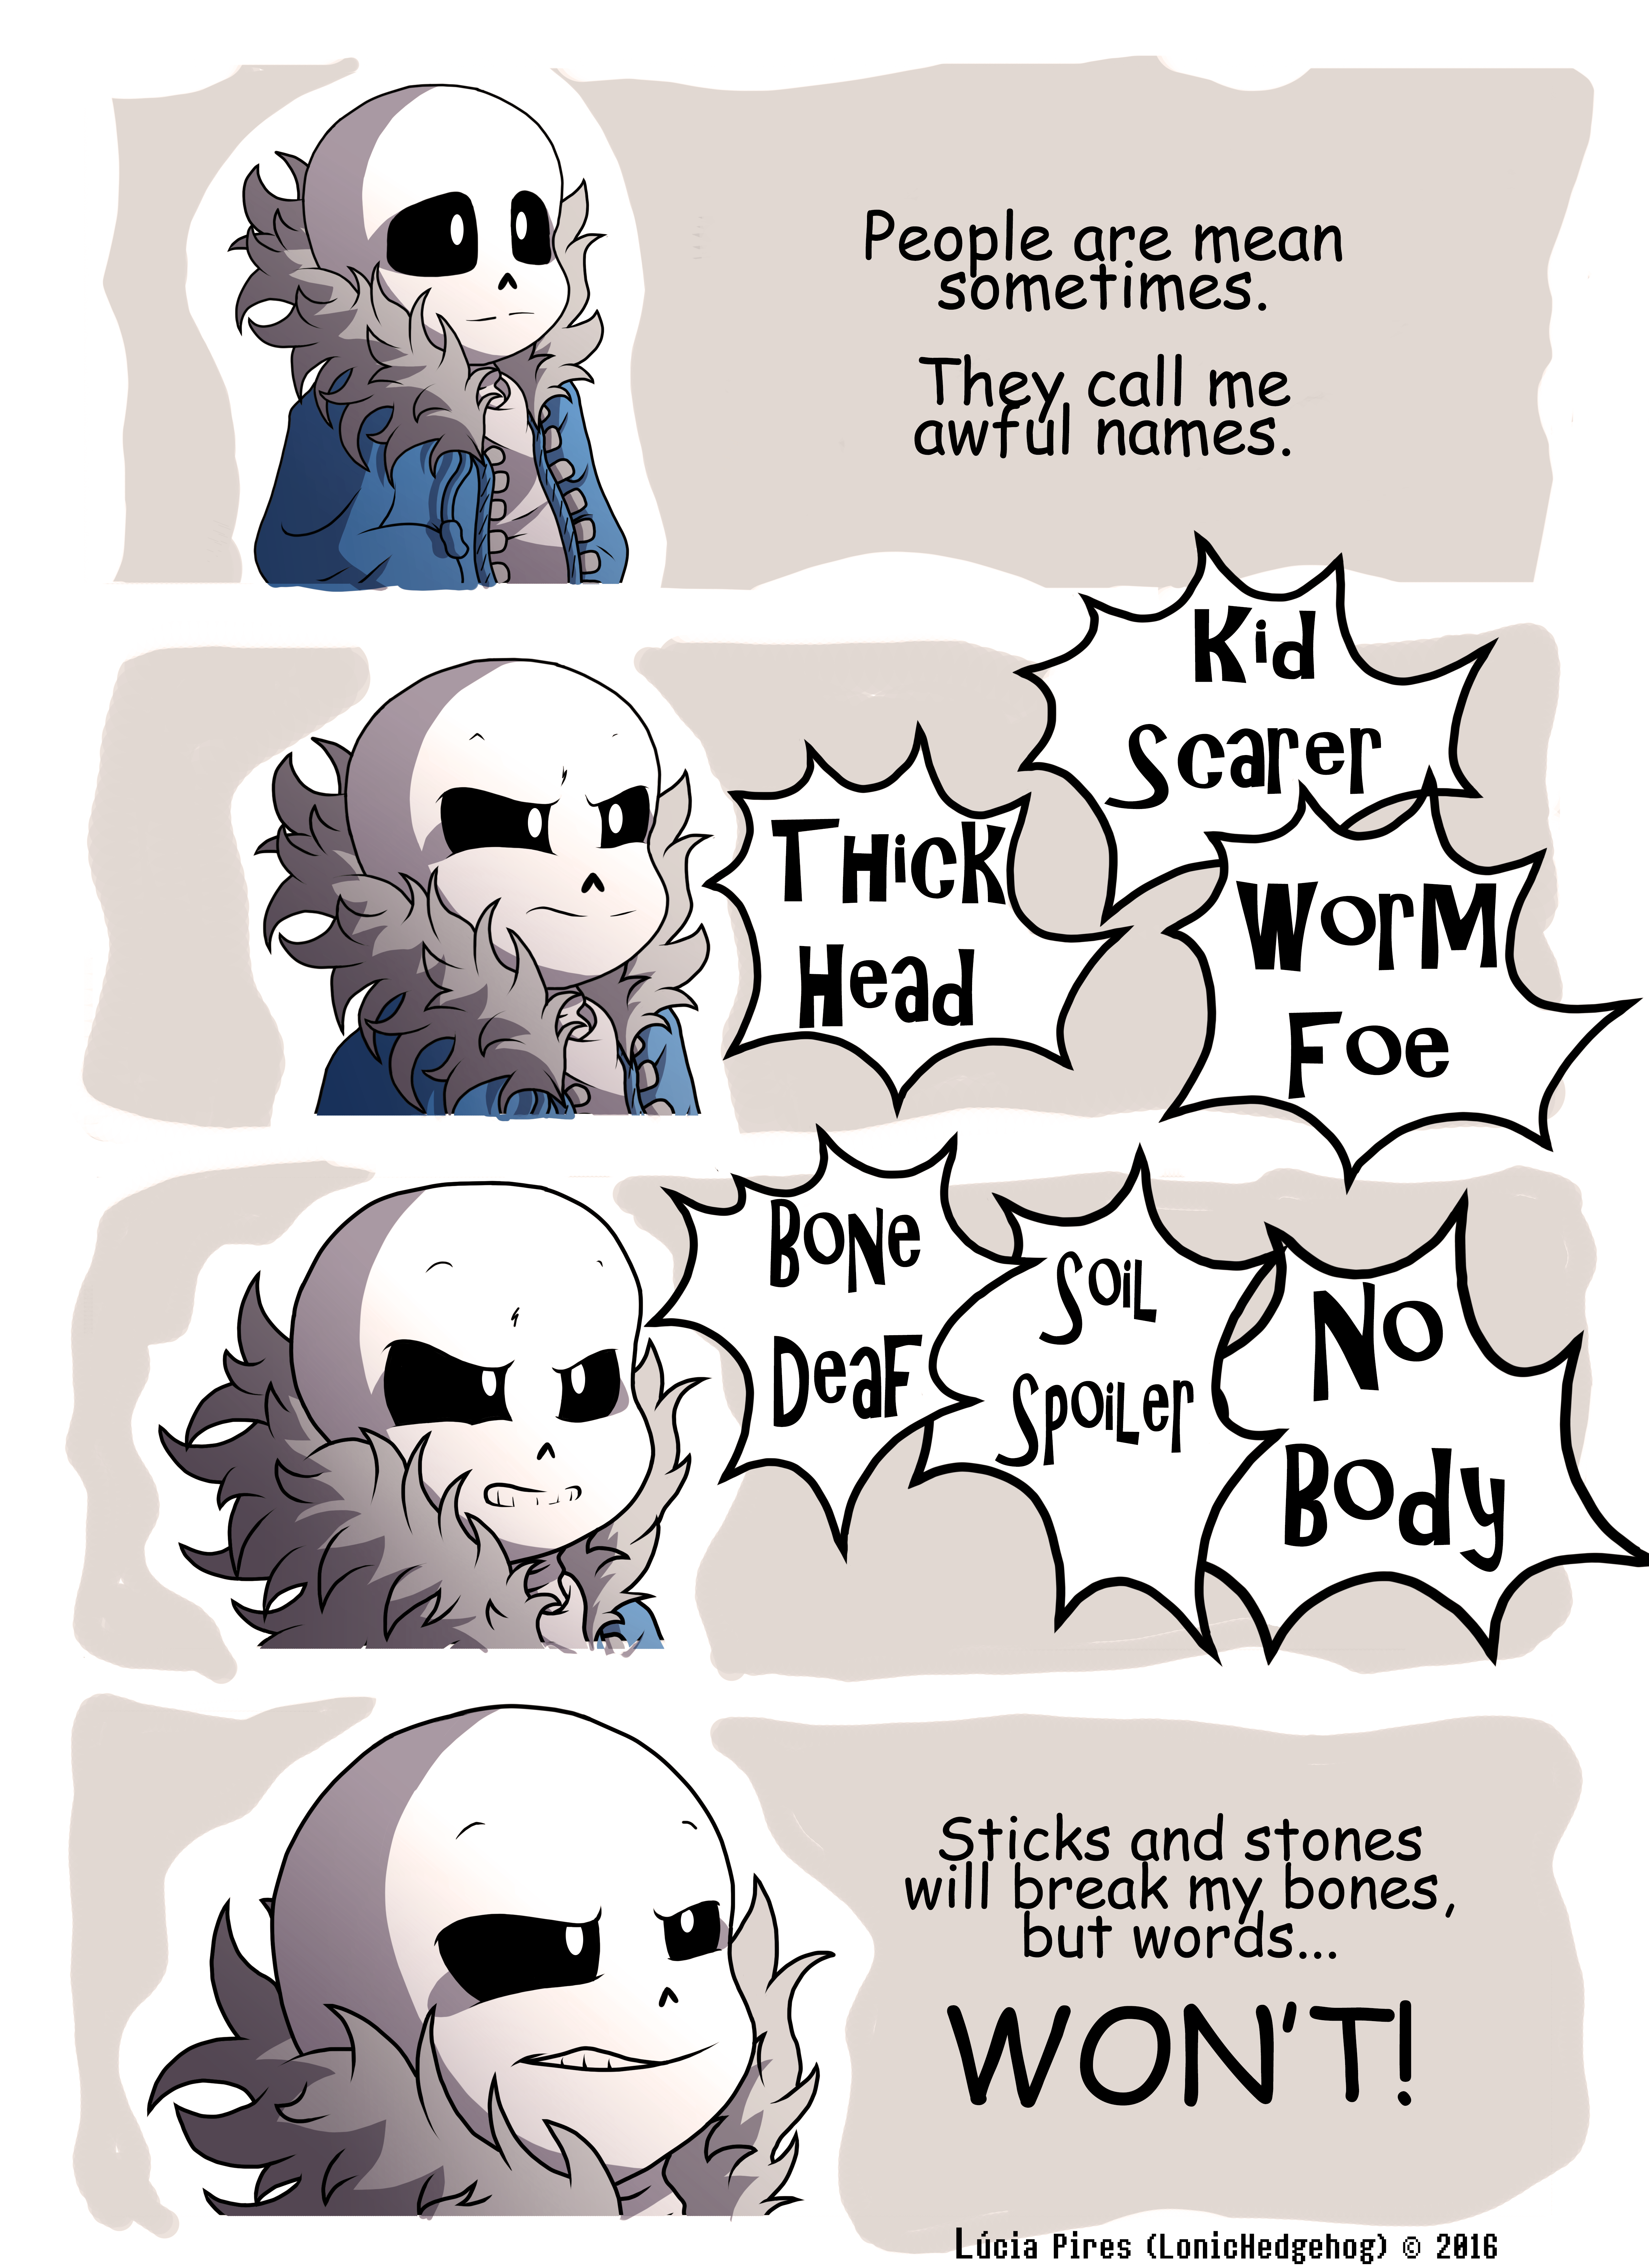 Undertale Comic - But words WON'T! by LonicHedgehog